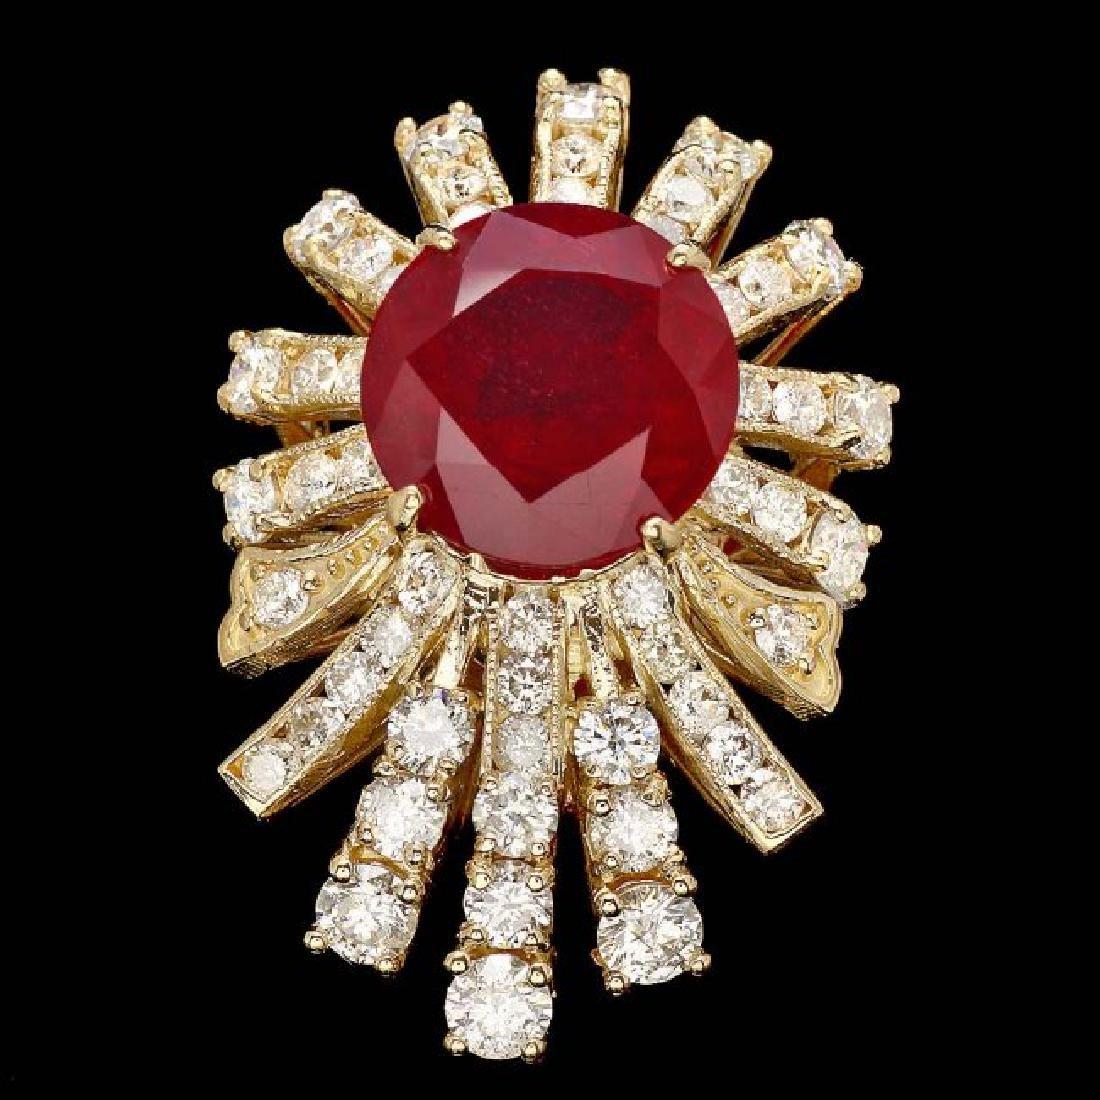 14k Yellow Gold 7.00ct Ruby 2.60ct Diamond Ring